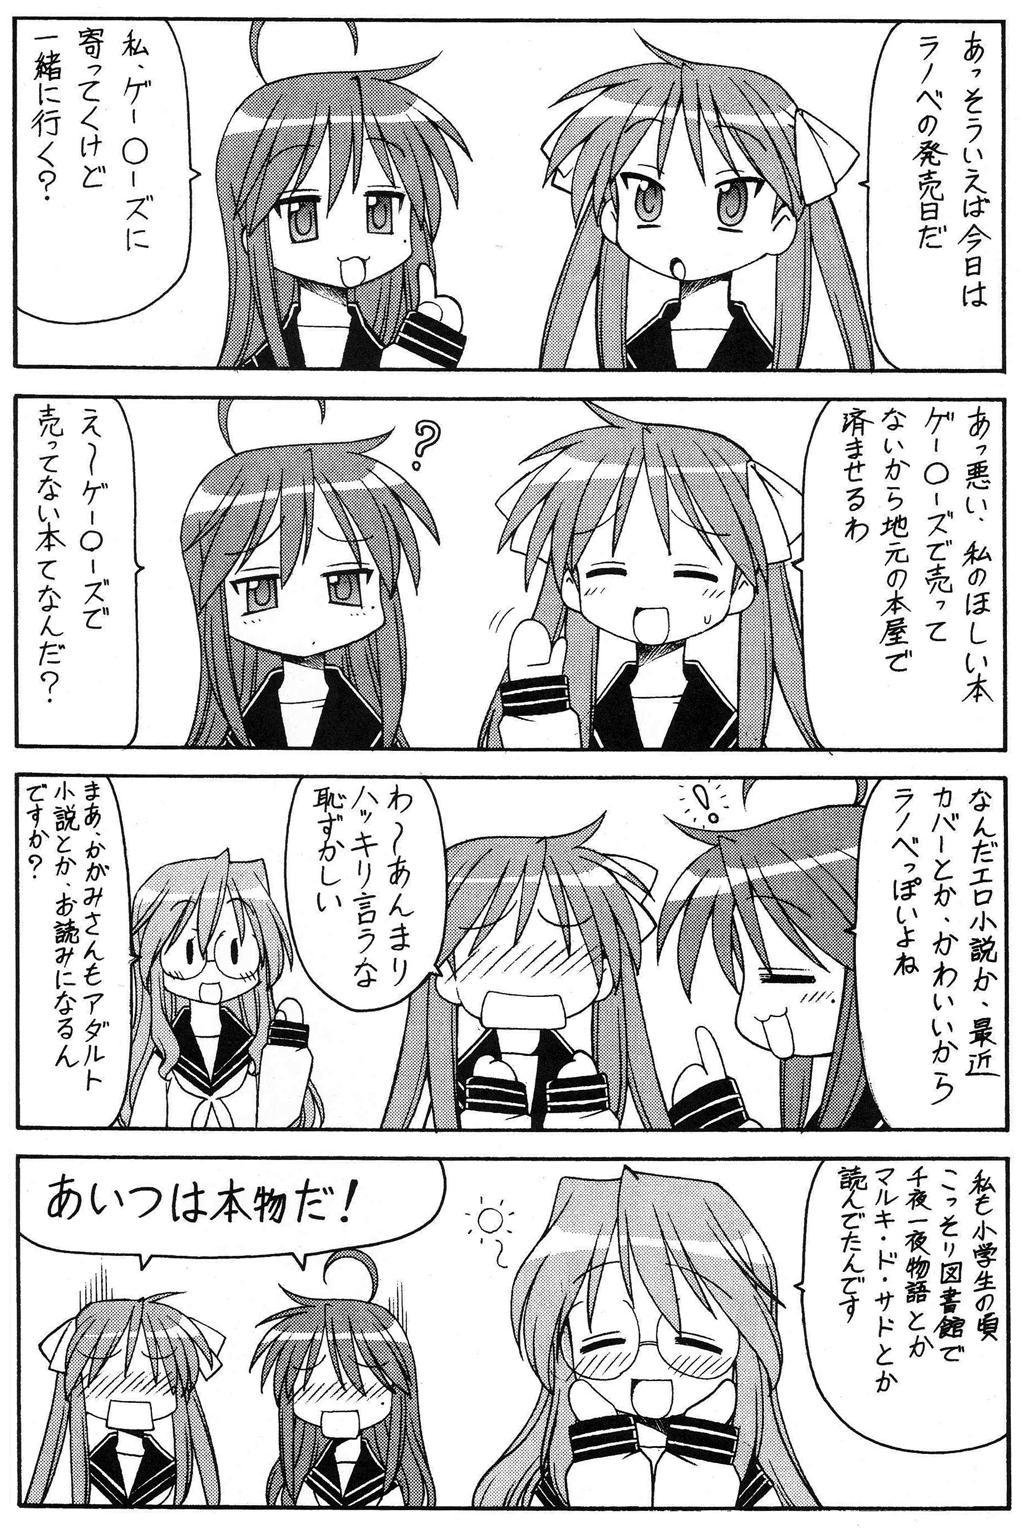 Yatteke! Sailor Fuku 1 26